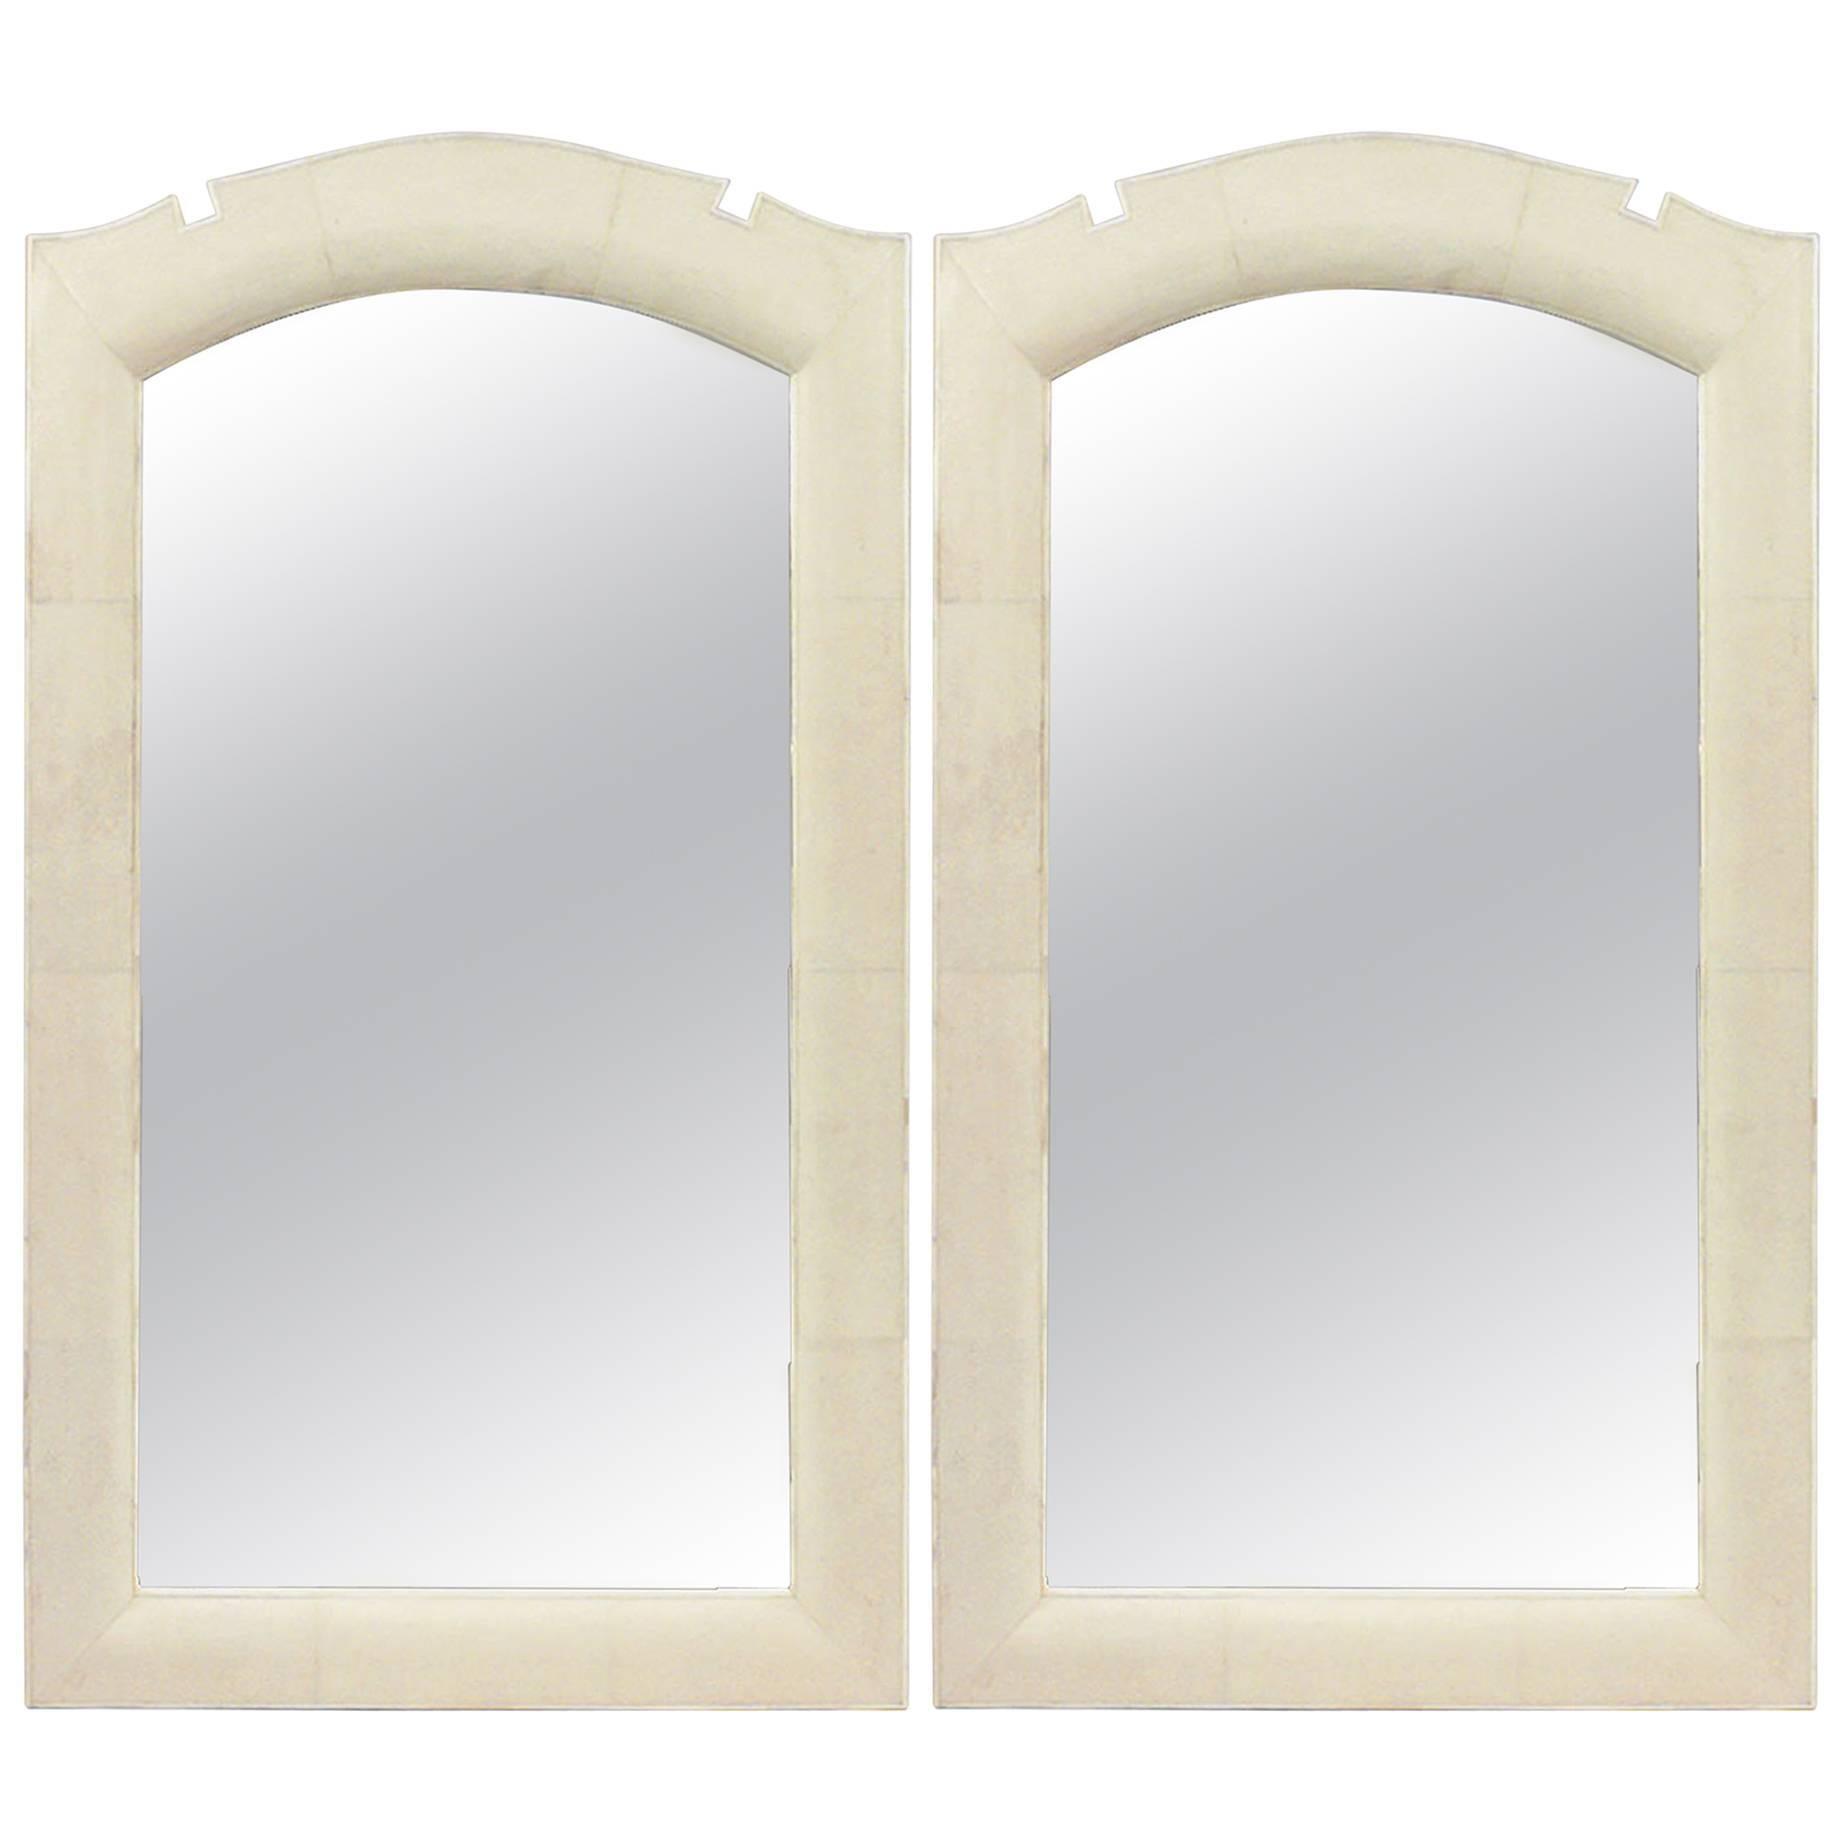 Modern French Art Deco Style Bone-Inlaid Shagreen Wall Mirrors